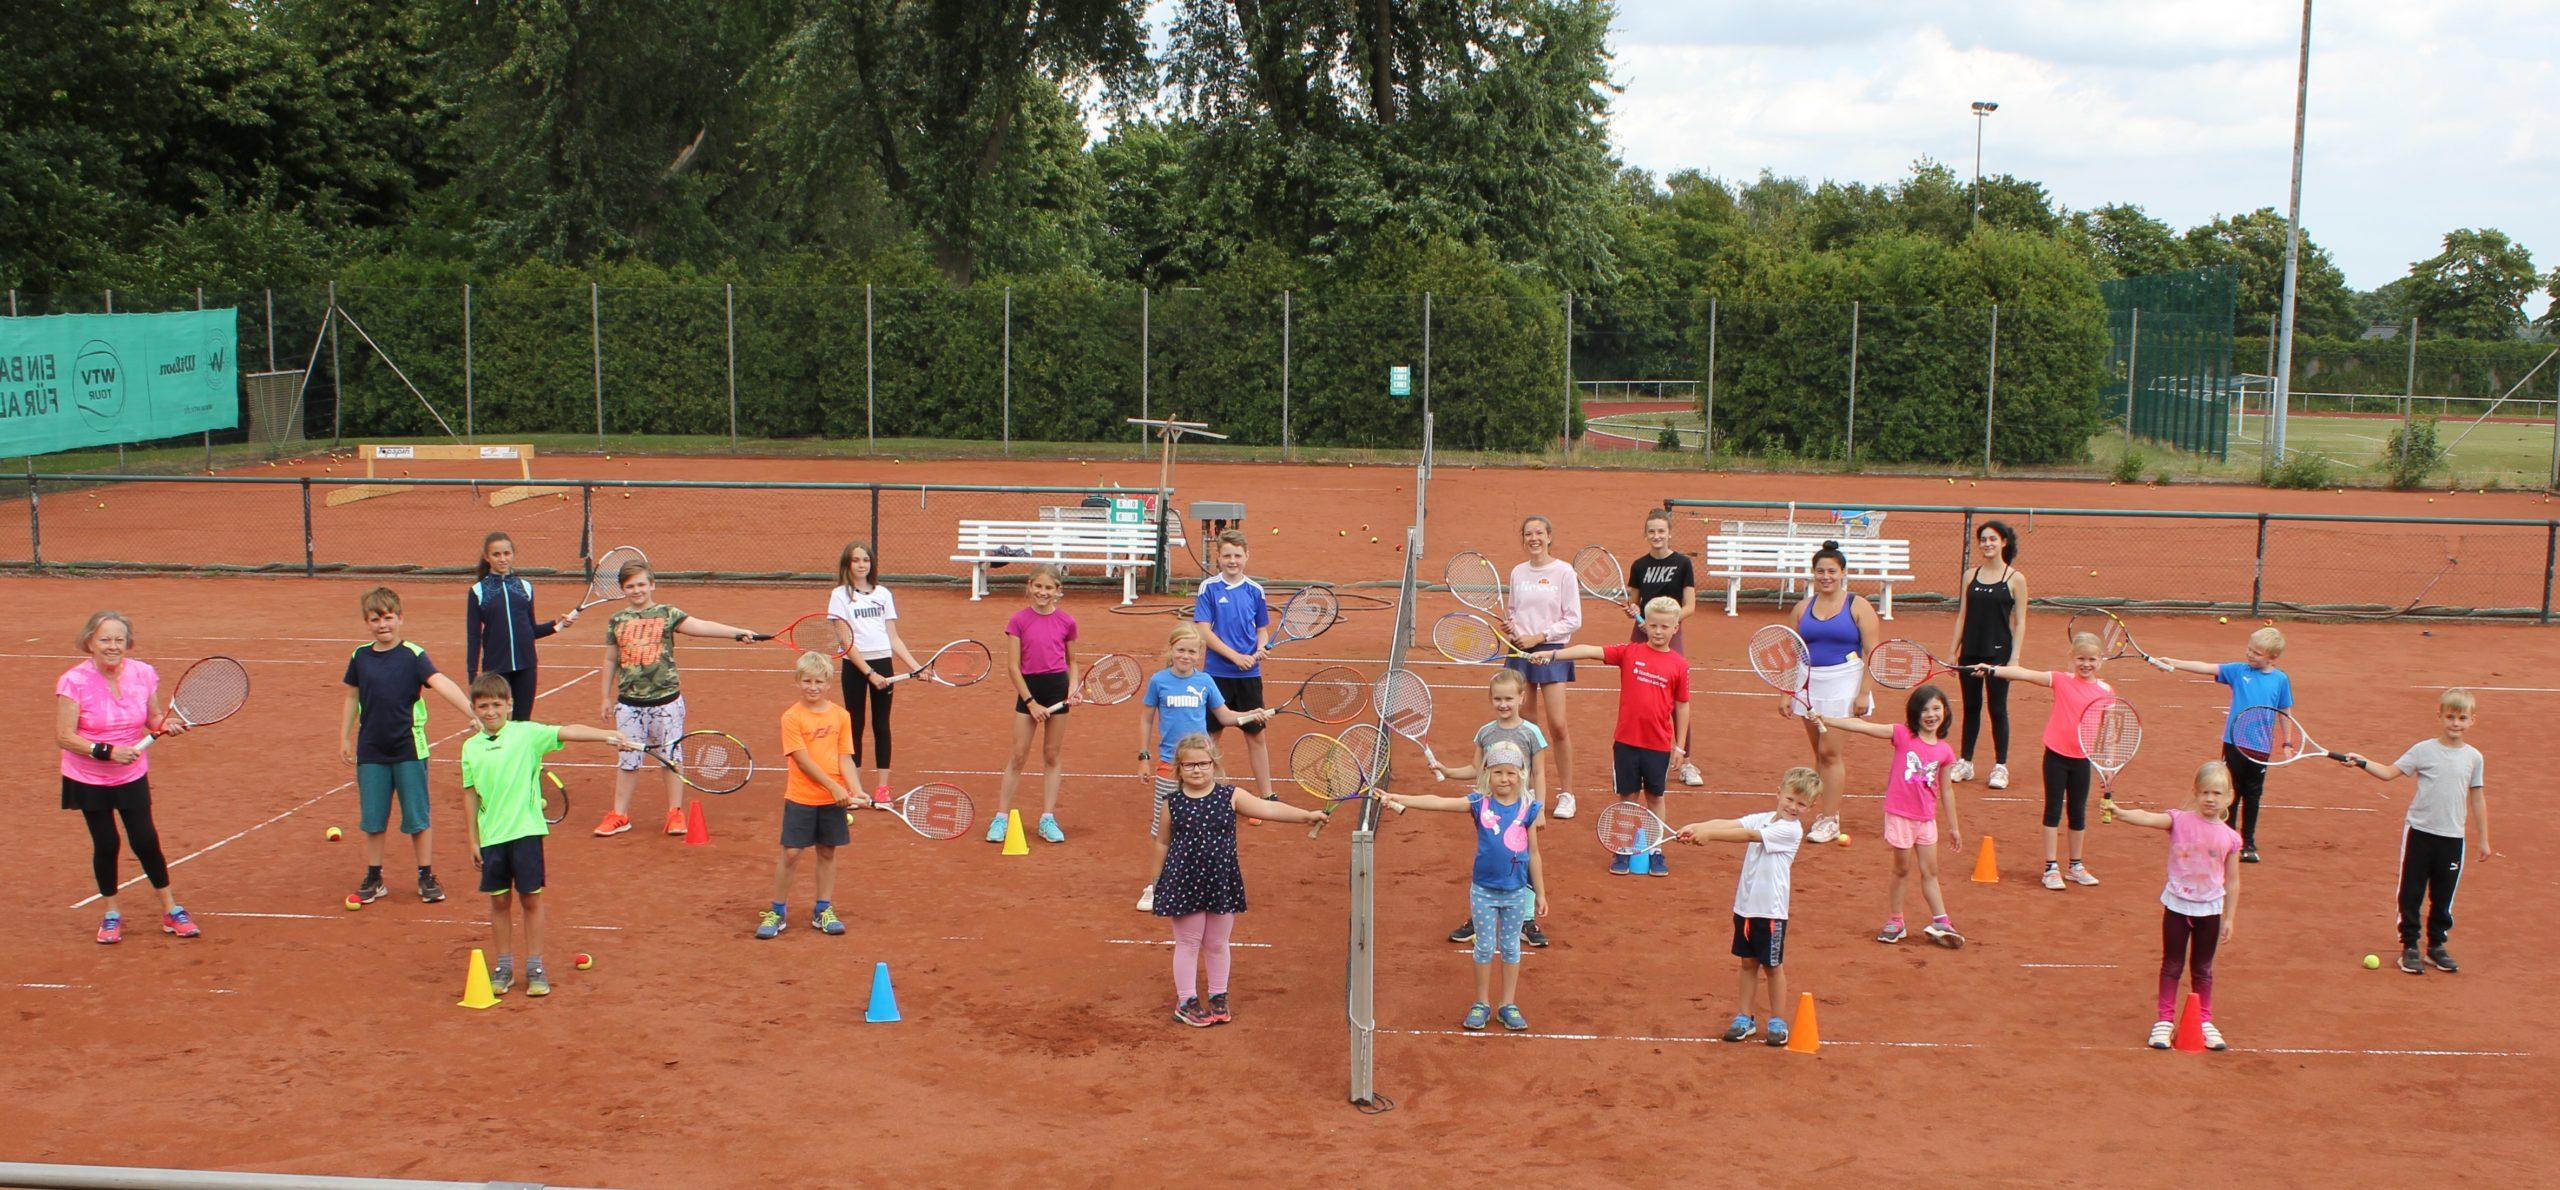 Tenniscamp 2020 IMG_7711-1